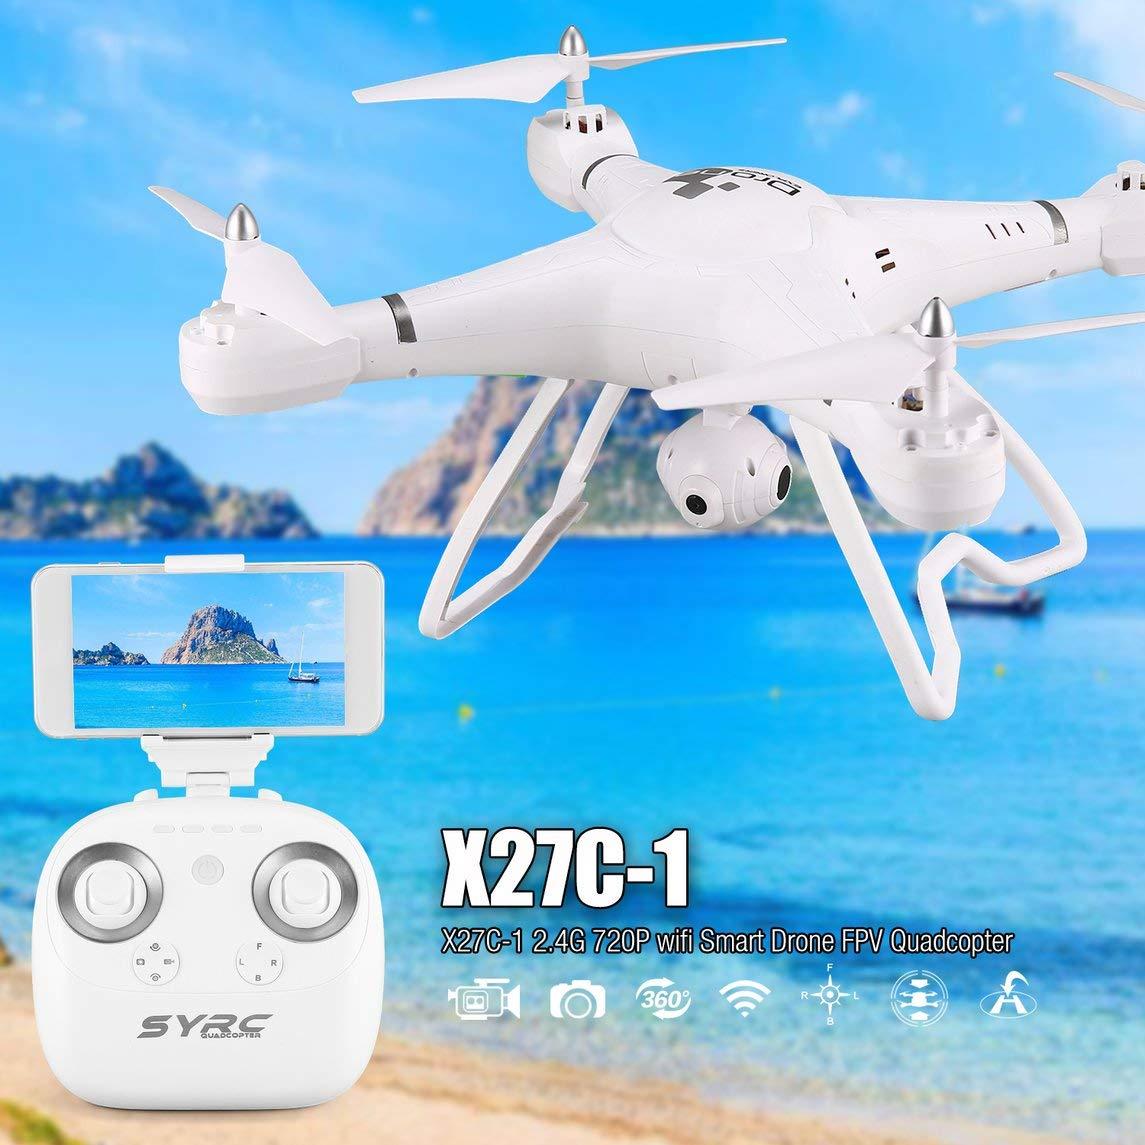 Footprintse X27C-1 2.4G RC Selfie Smart Drone FPV Quadcopter Flugzeuge mit 720P HD Kamera Echtzeit Höhe Hold Headless Modus 3D Flip-Farbe:Schwarz